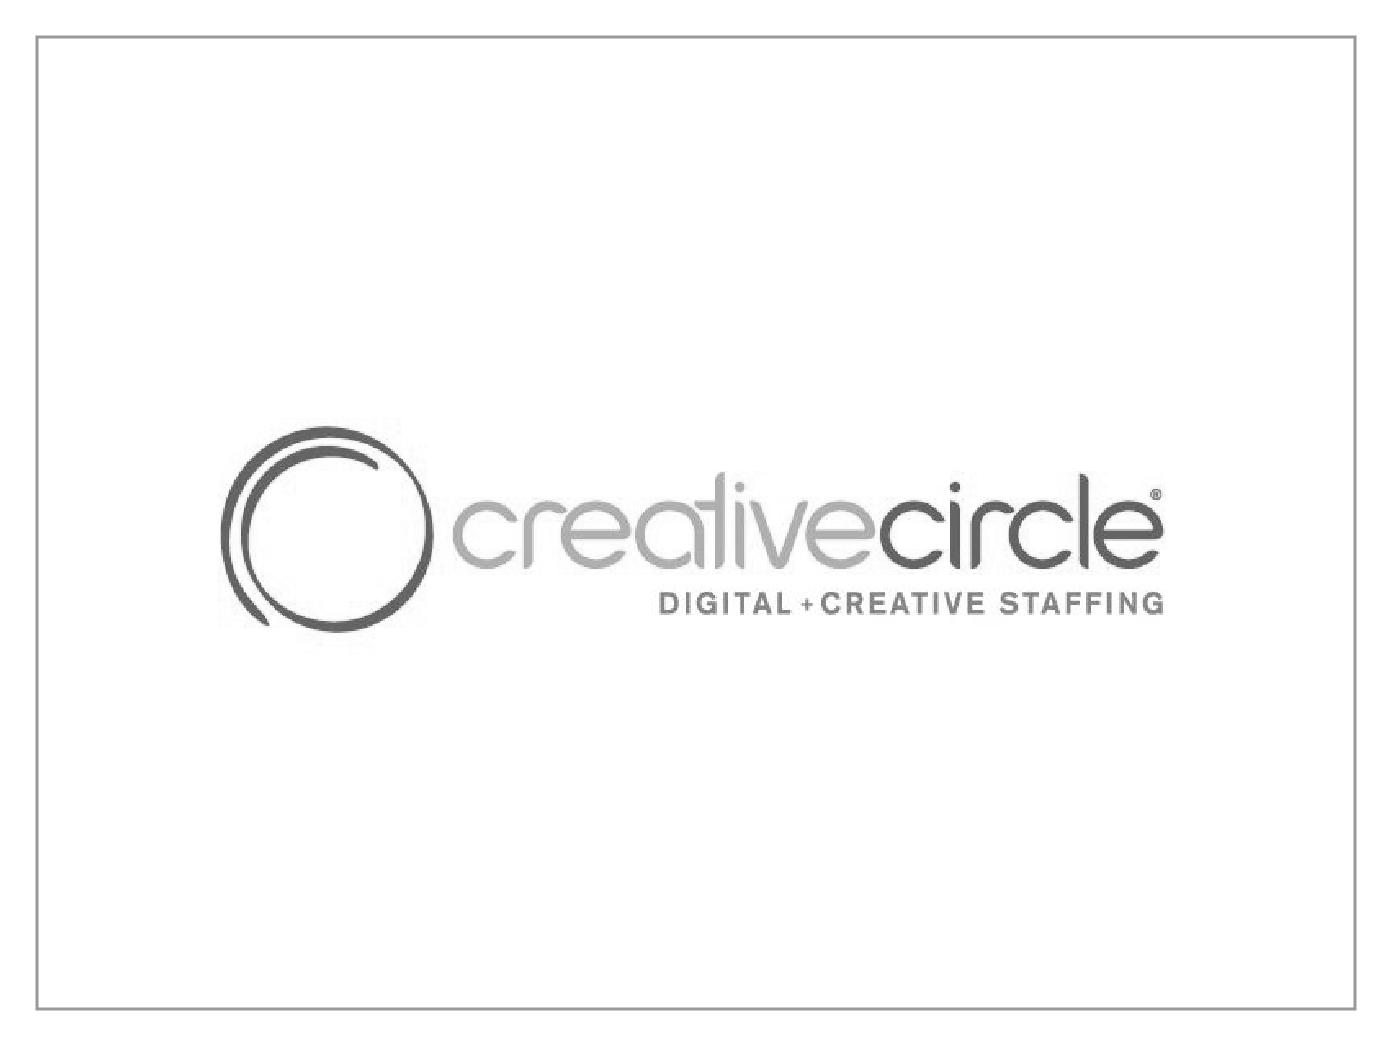 creativecircle_Logo.png